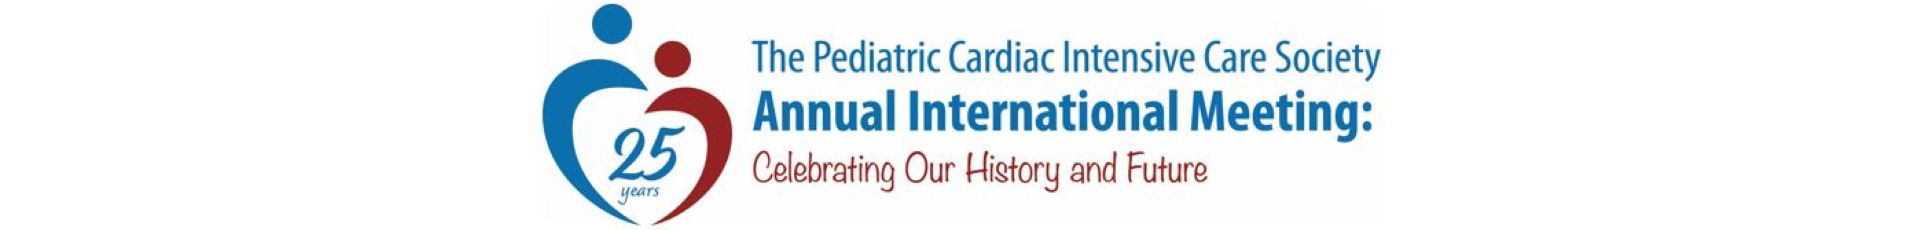 PCICS 2021 Event Banner